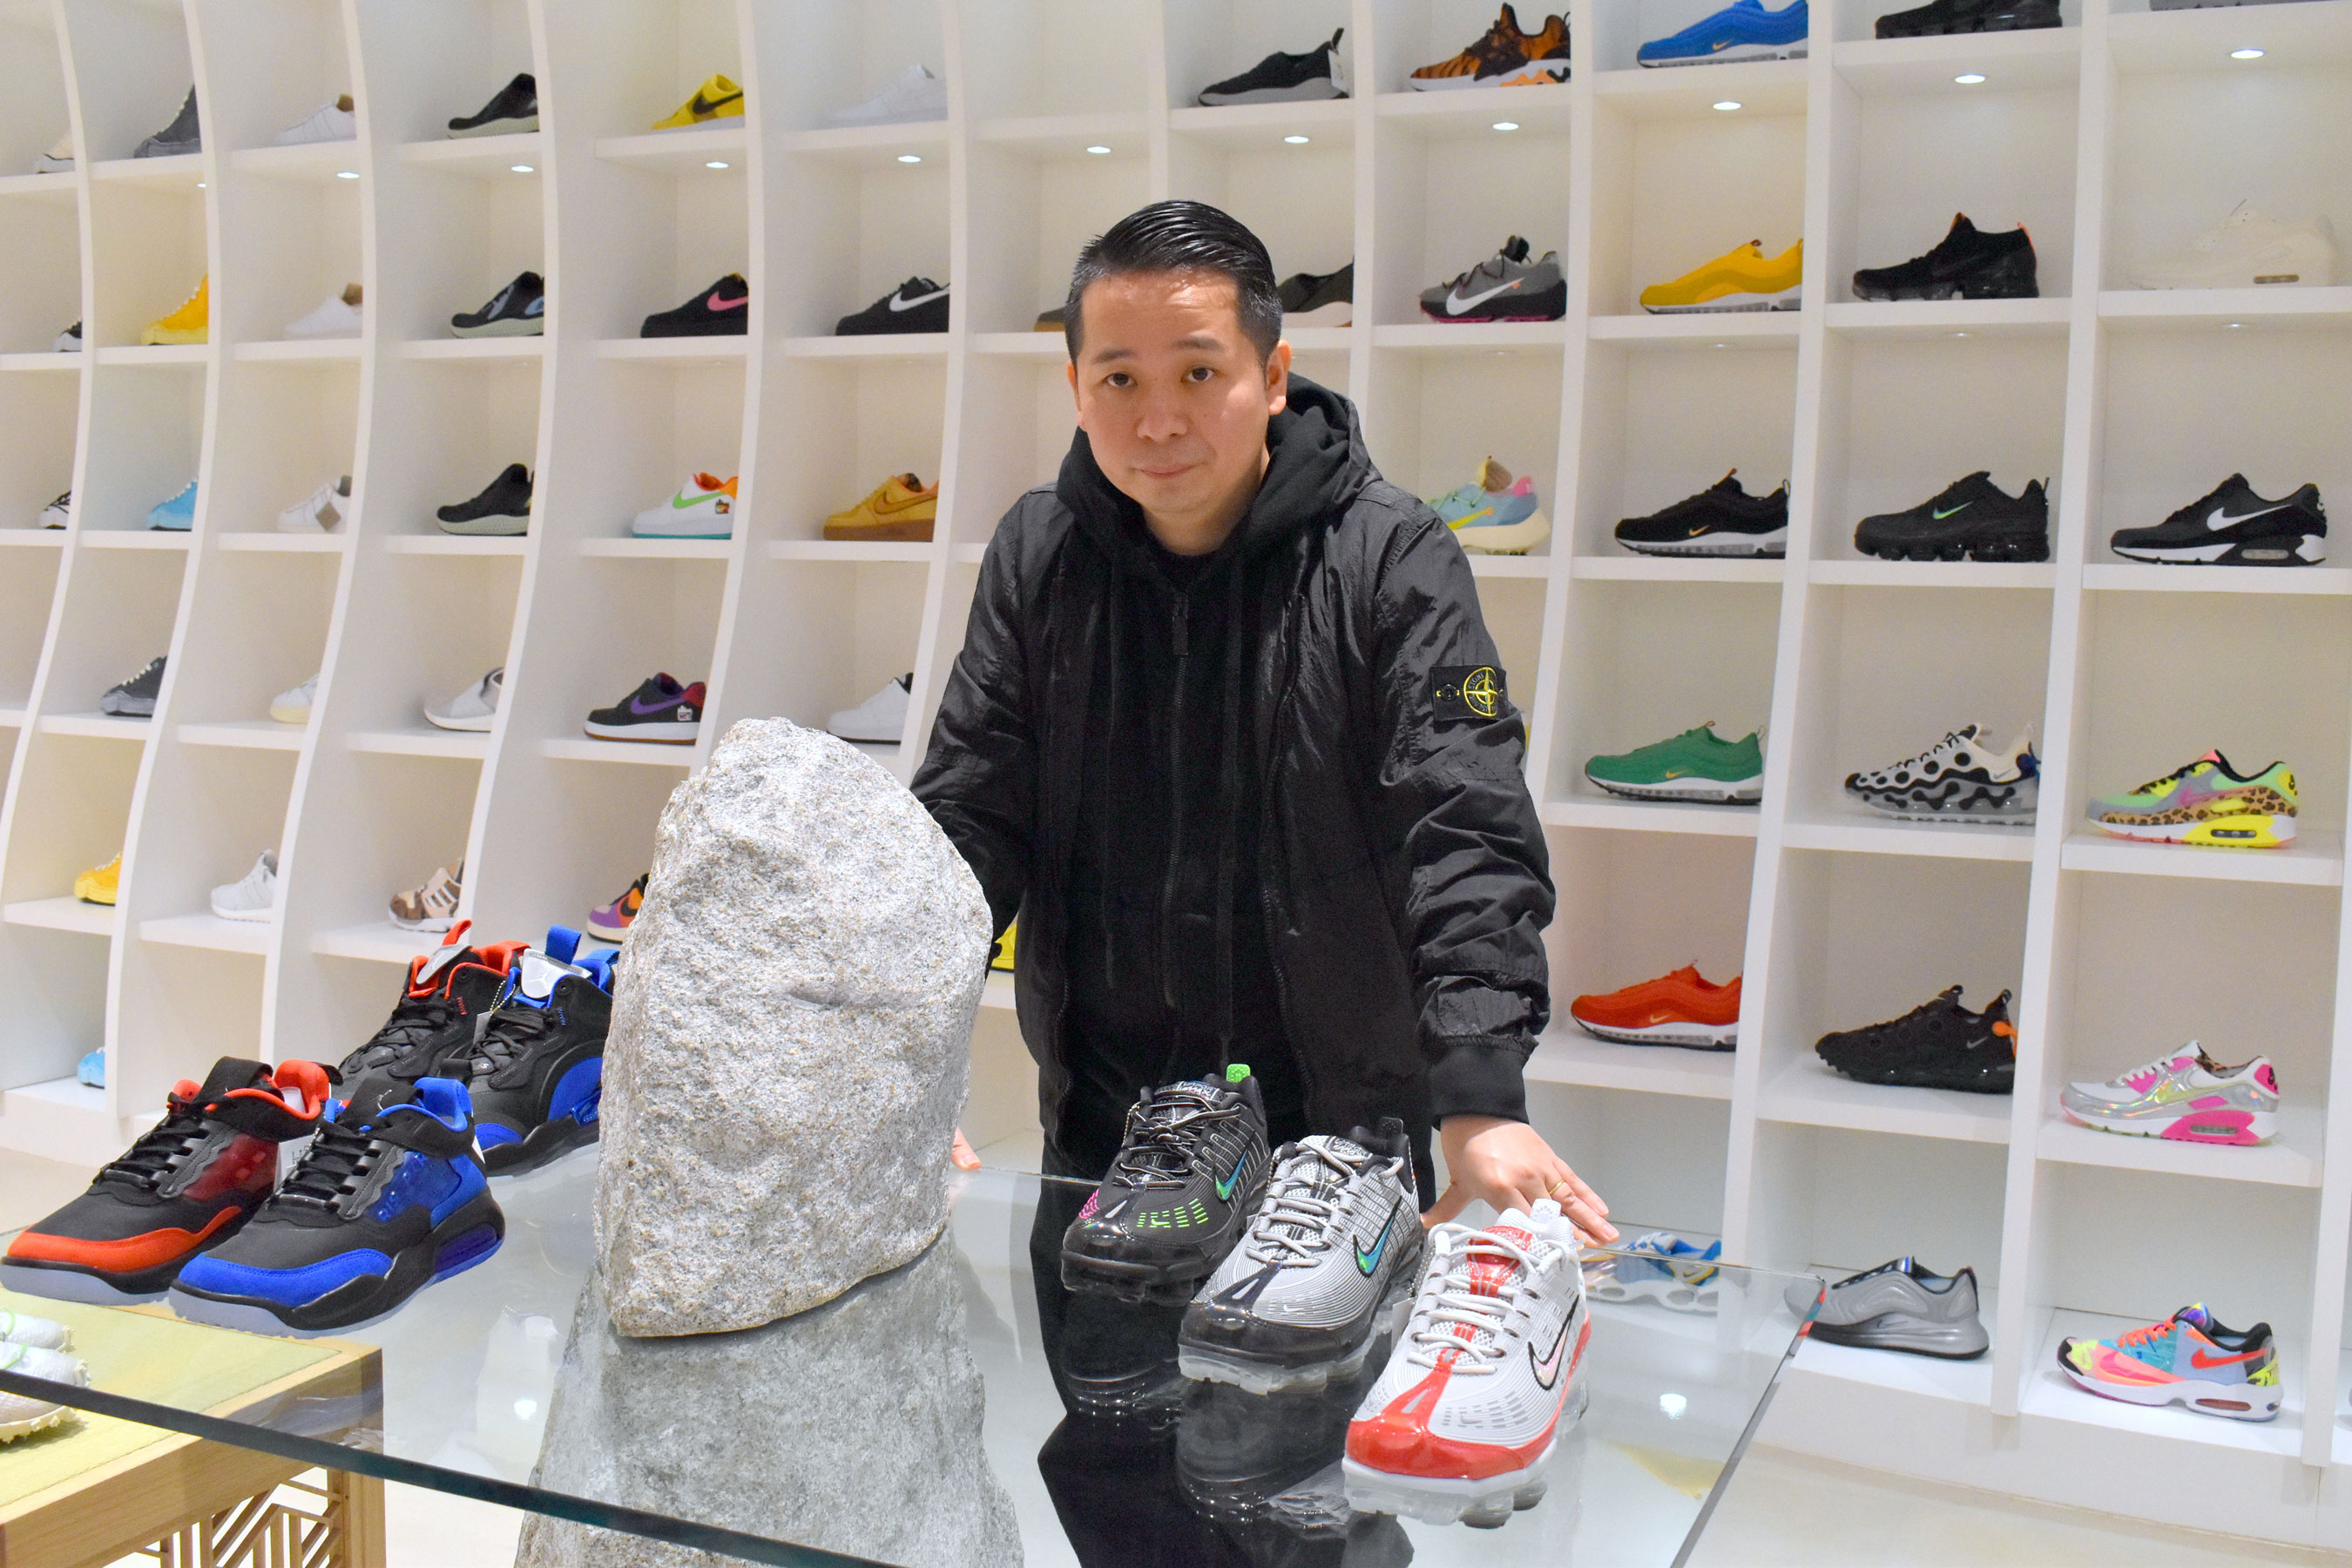 Sneakers: Just for kicks